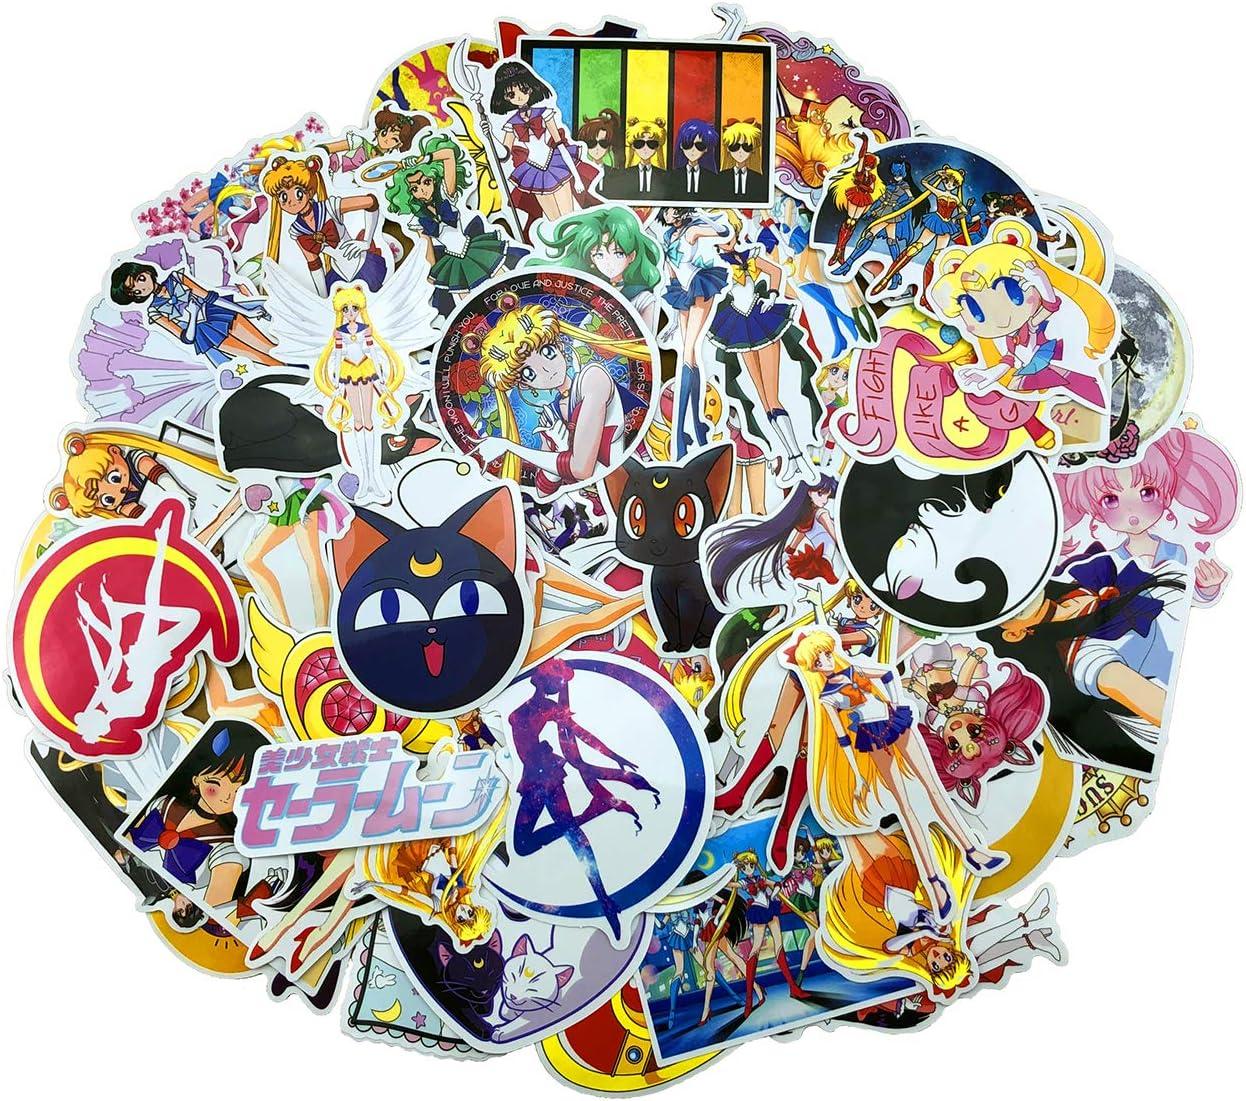 84PCS Sailor Moon Sticker Cool Vinyl Decals, Kid Adult Children Clear Stickers No-Duplicate Waterproof Decal for iPhone Mac Book Bottle Skateboard Guitar Case Car Bike Bumper Luggage Door Decoration